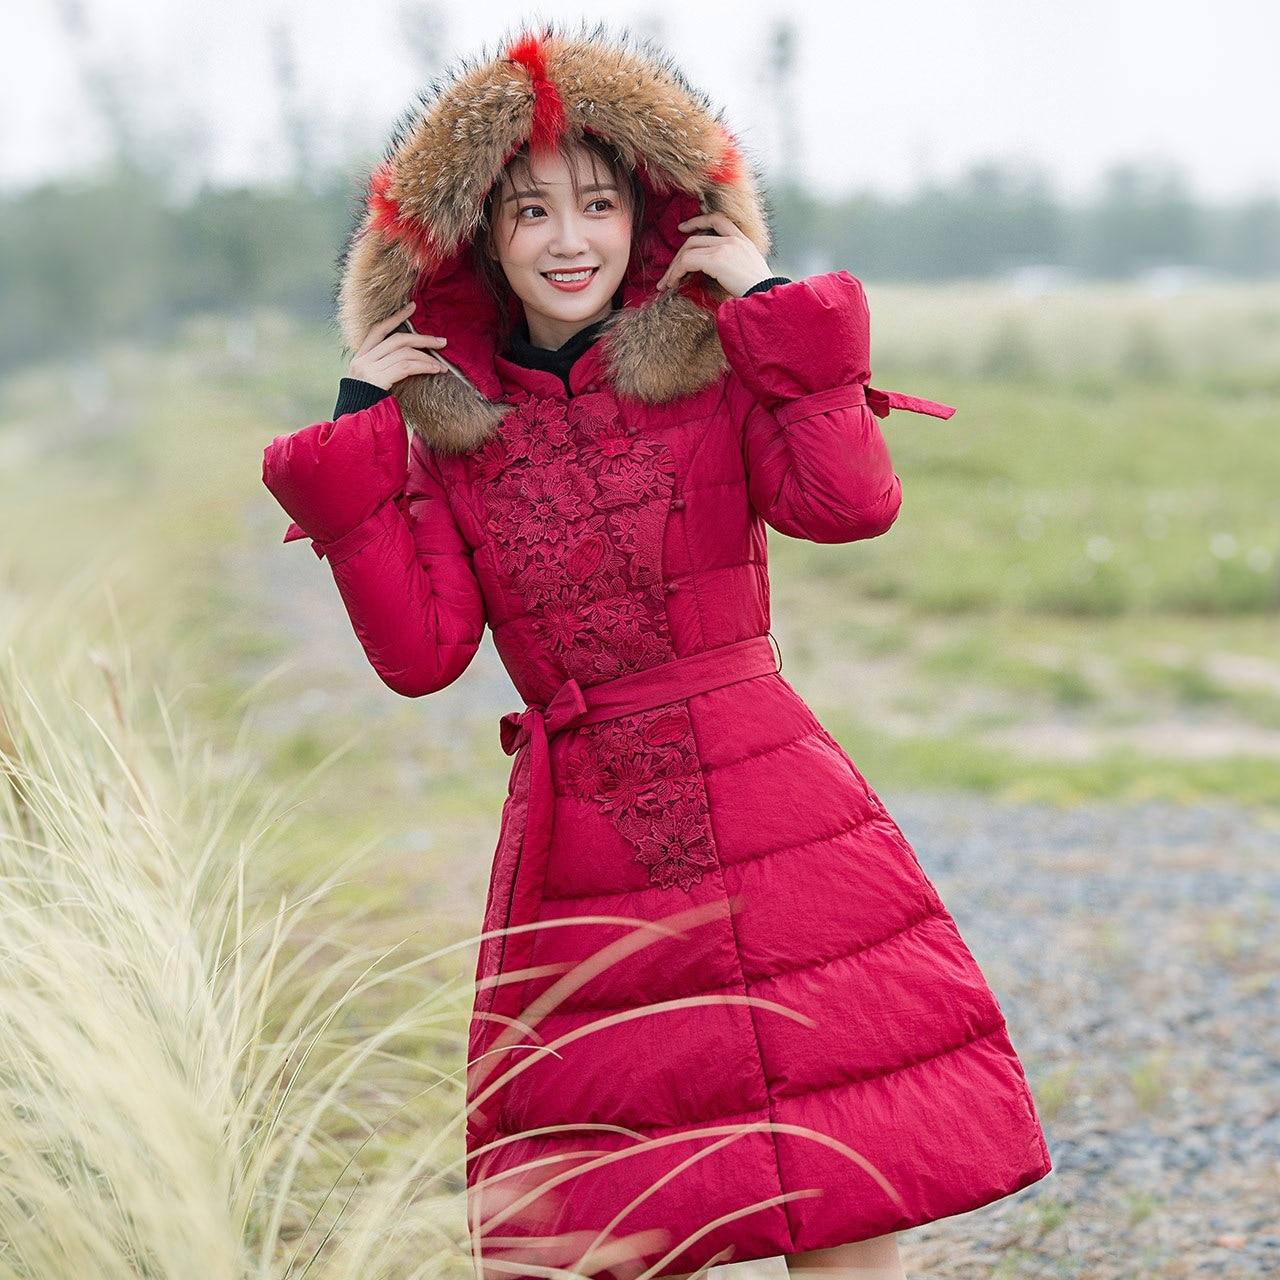 Winter Warm Coat Women's New Duck Down Parka Ladies Temperament Real Fur Collar Thick Plush Warm Coat Long Overcoat Hooded Coats Supplement The Vital Energy And Nourish Yin